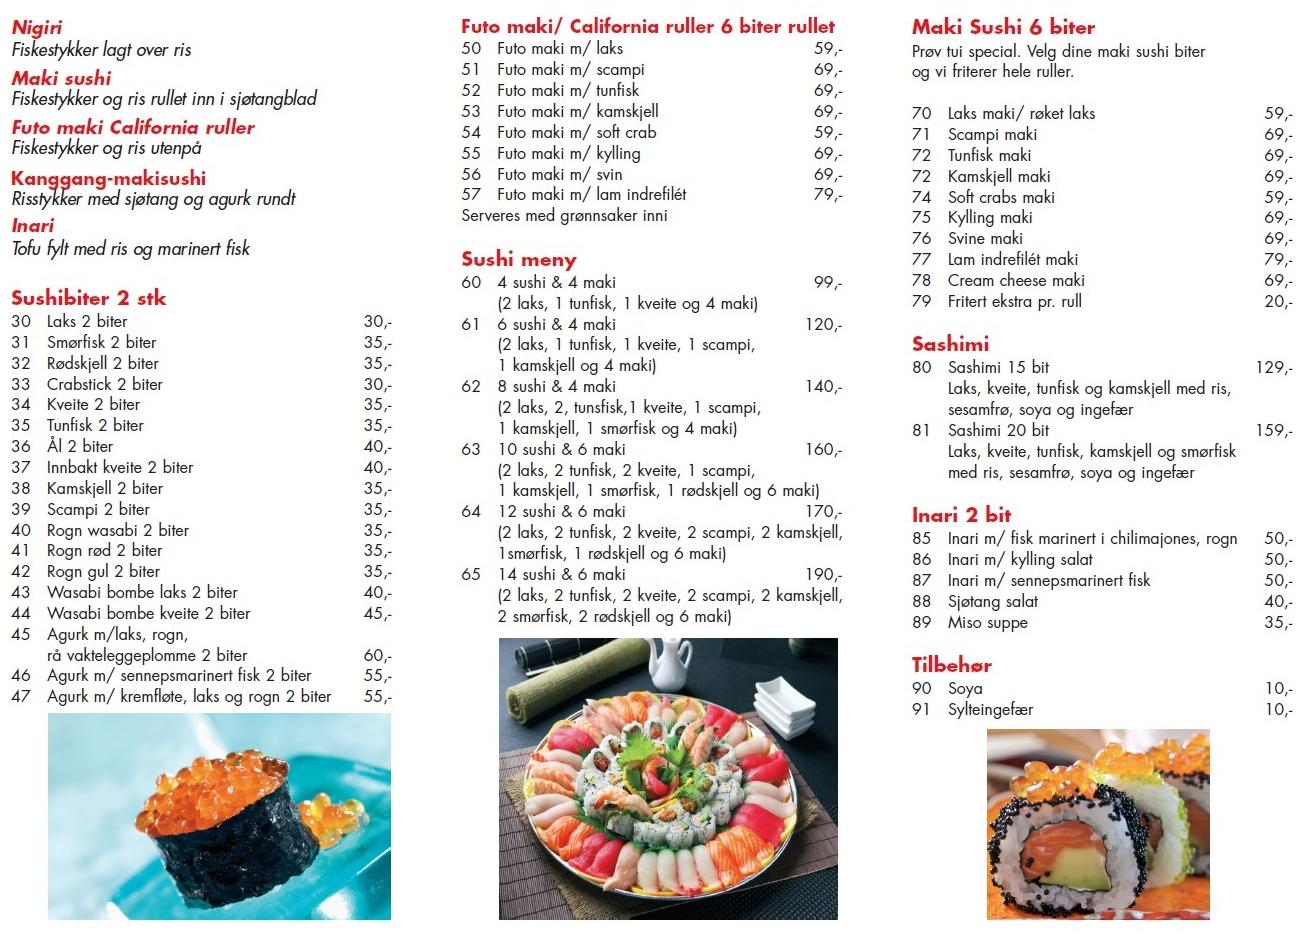 Sushi fredrikstad meny